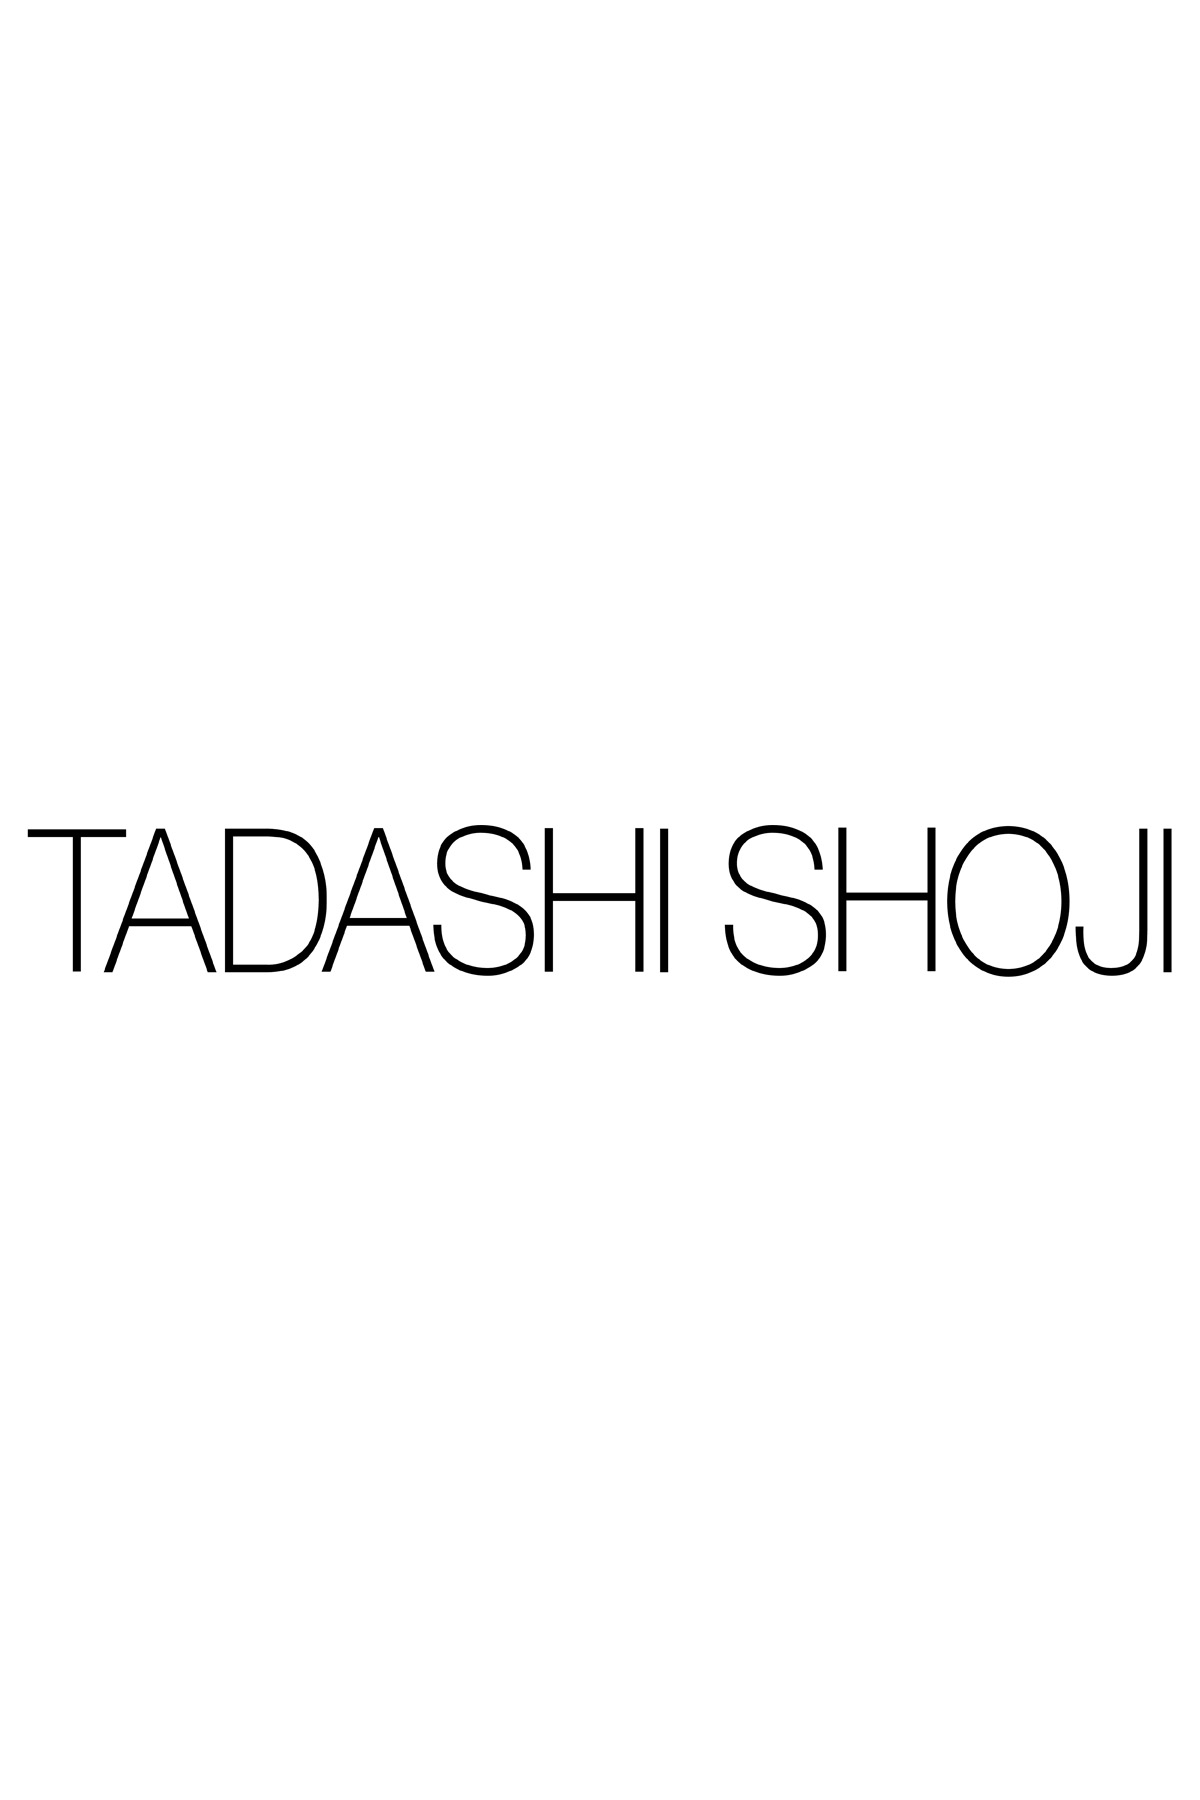 Tadashi Shoji - Tansy Floral Headpiece